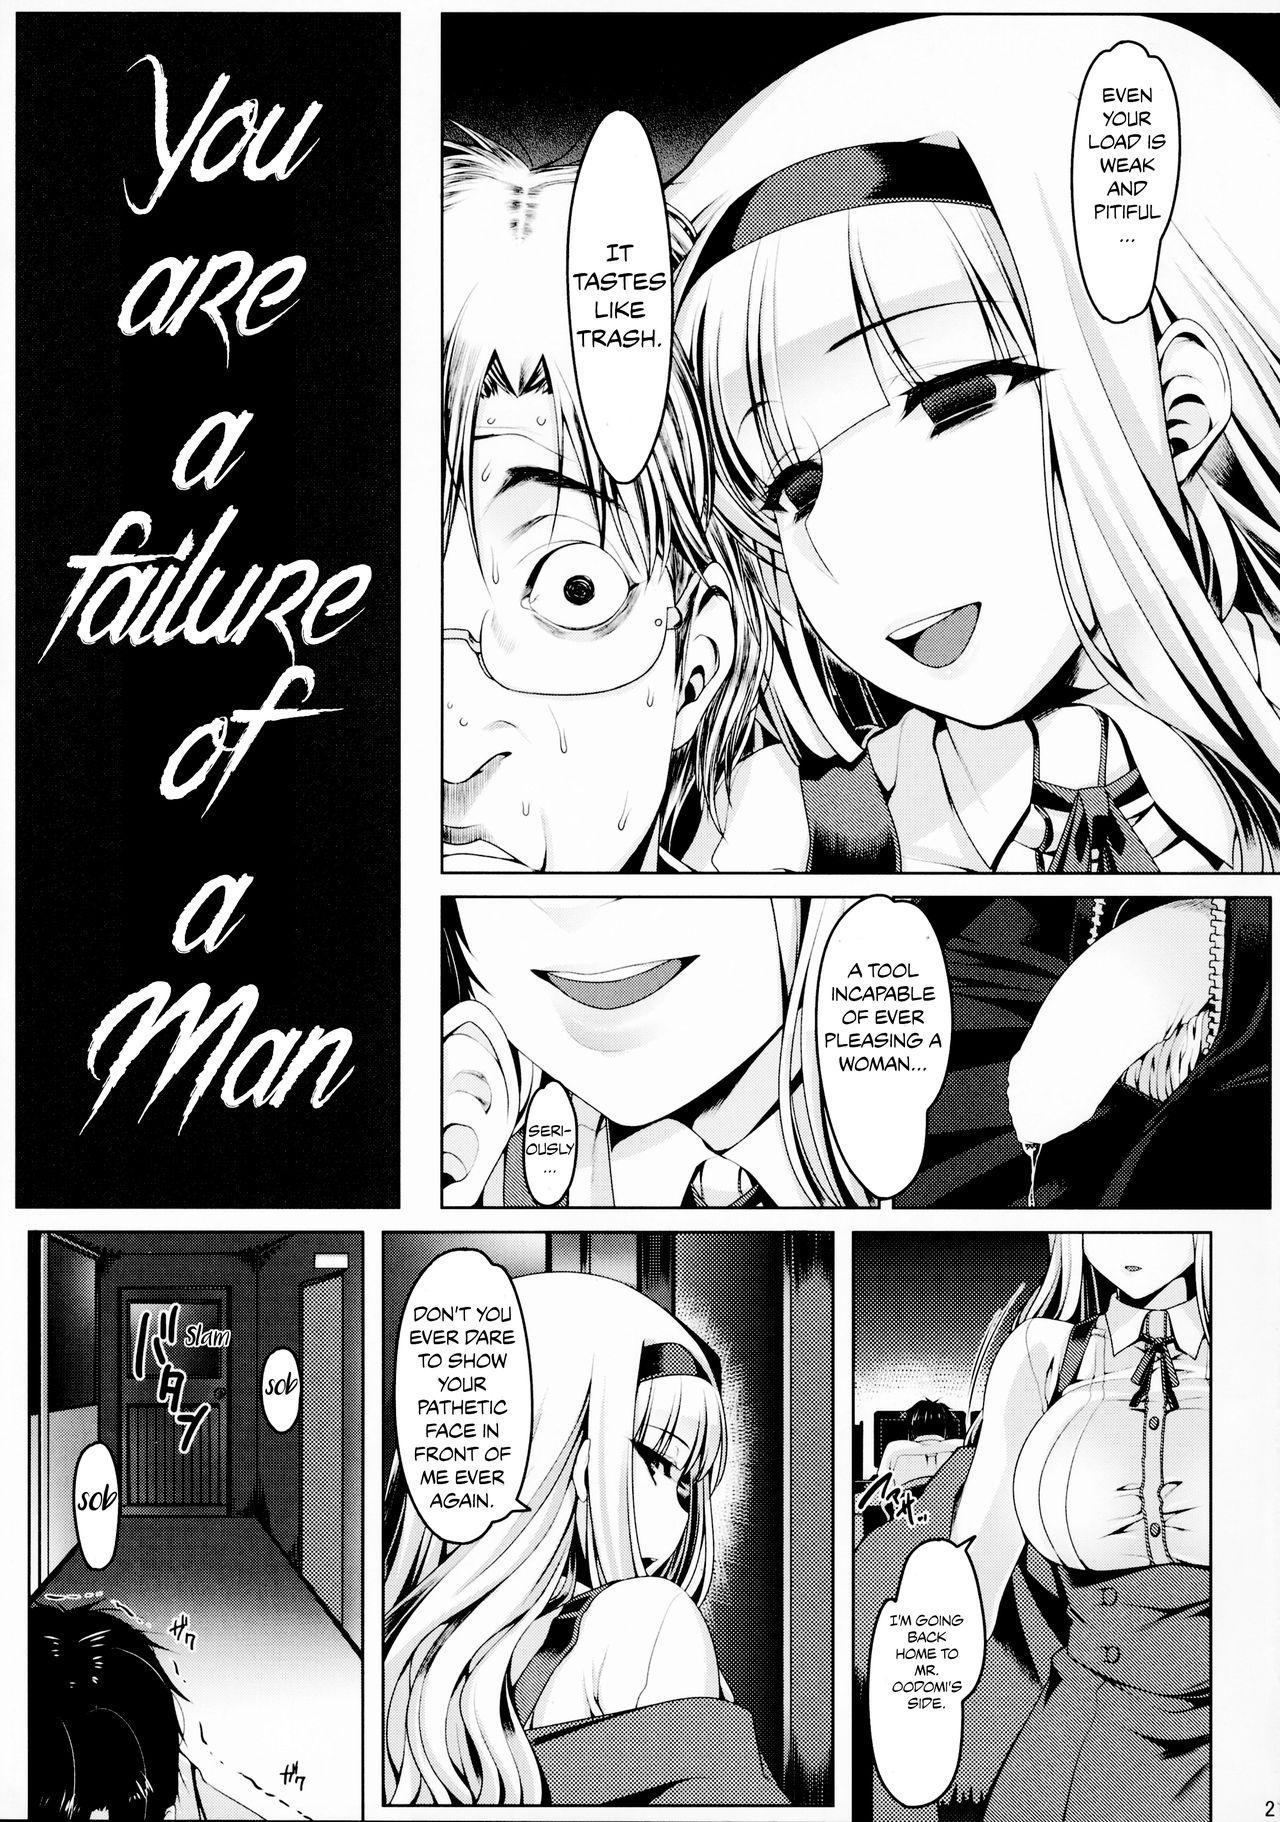 Oshirihime no Renbin | Compassion of the Anal Princess 19